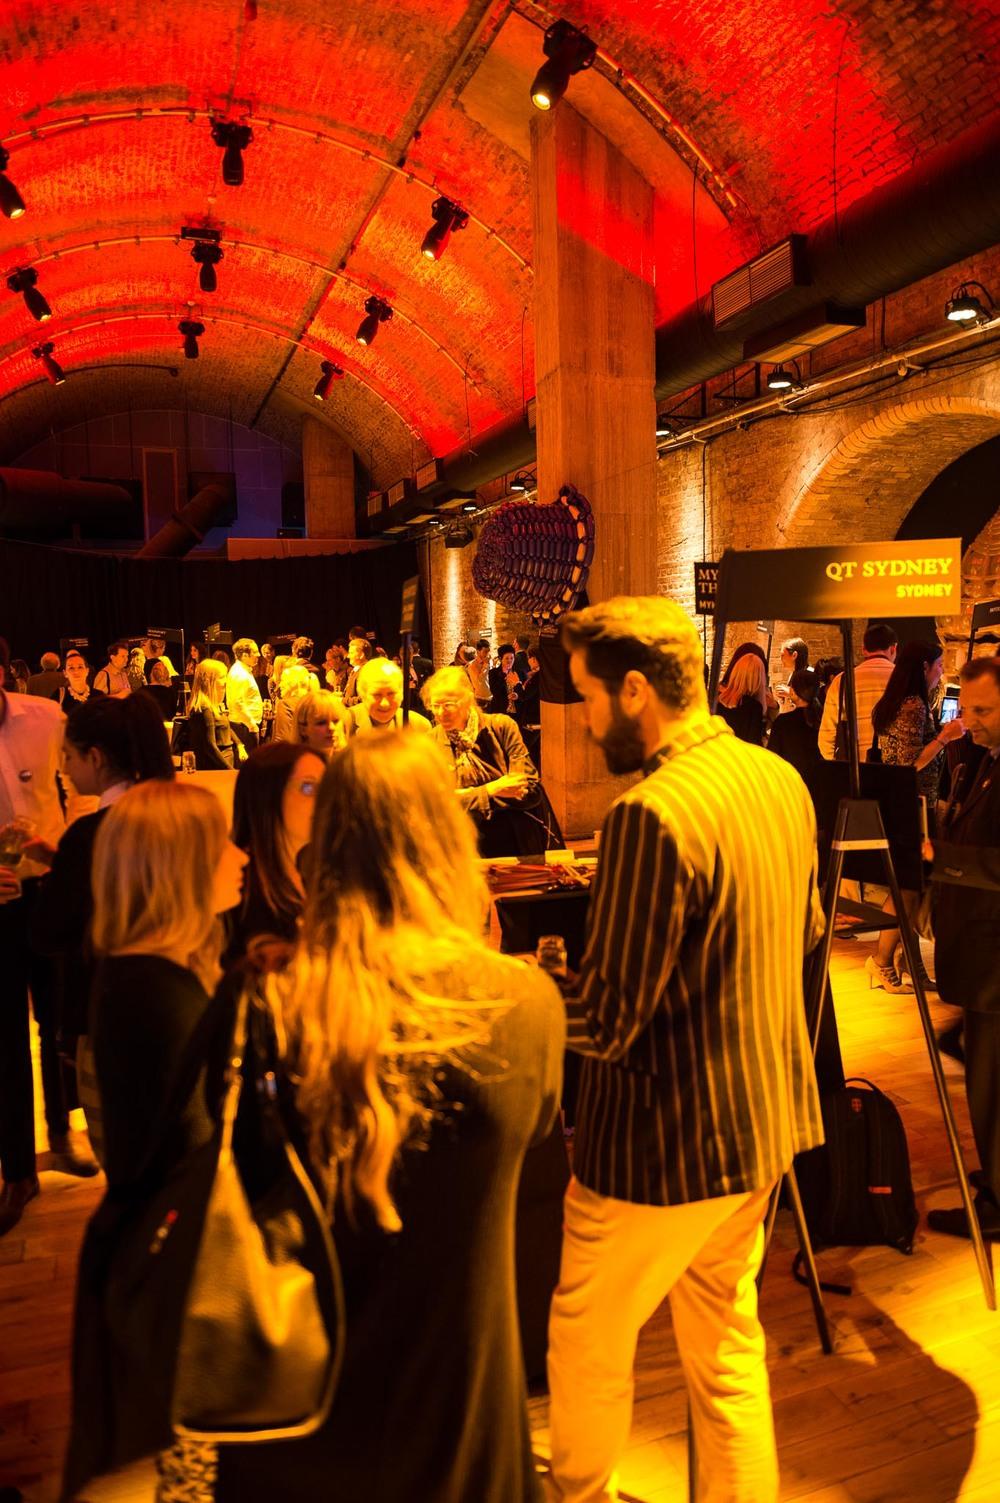 15_04_29_DH_event_London-233.jpg